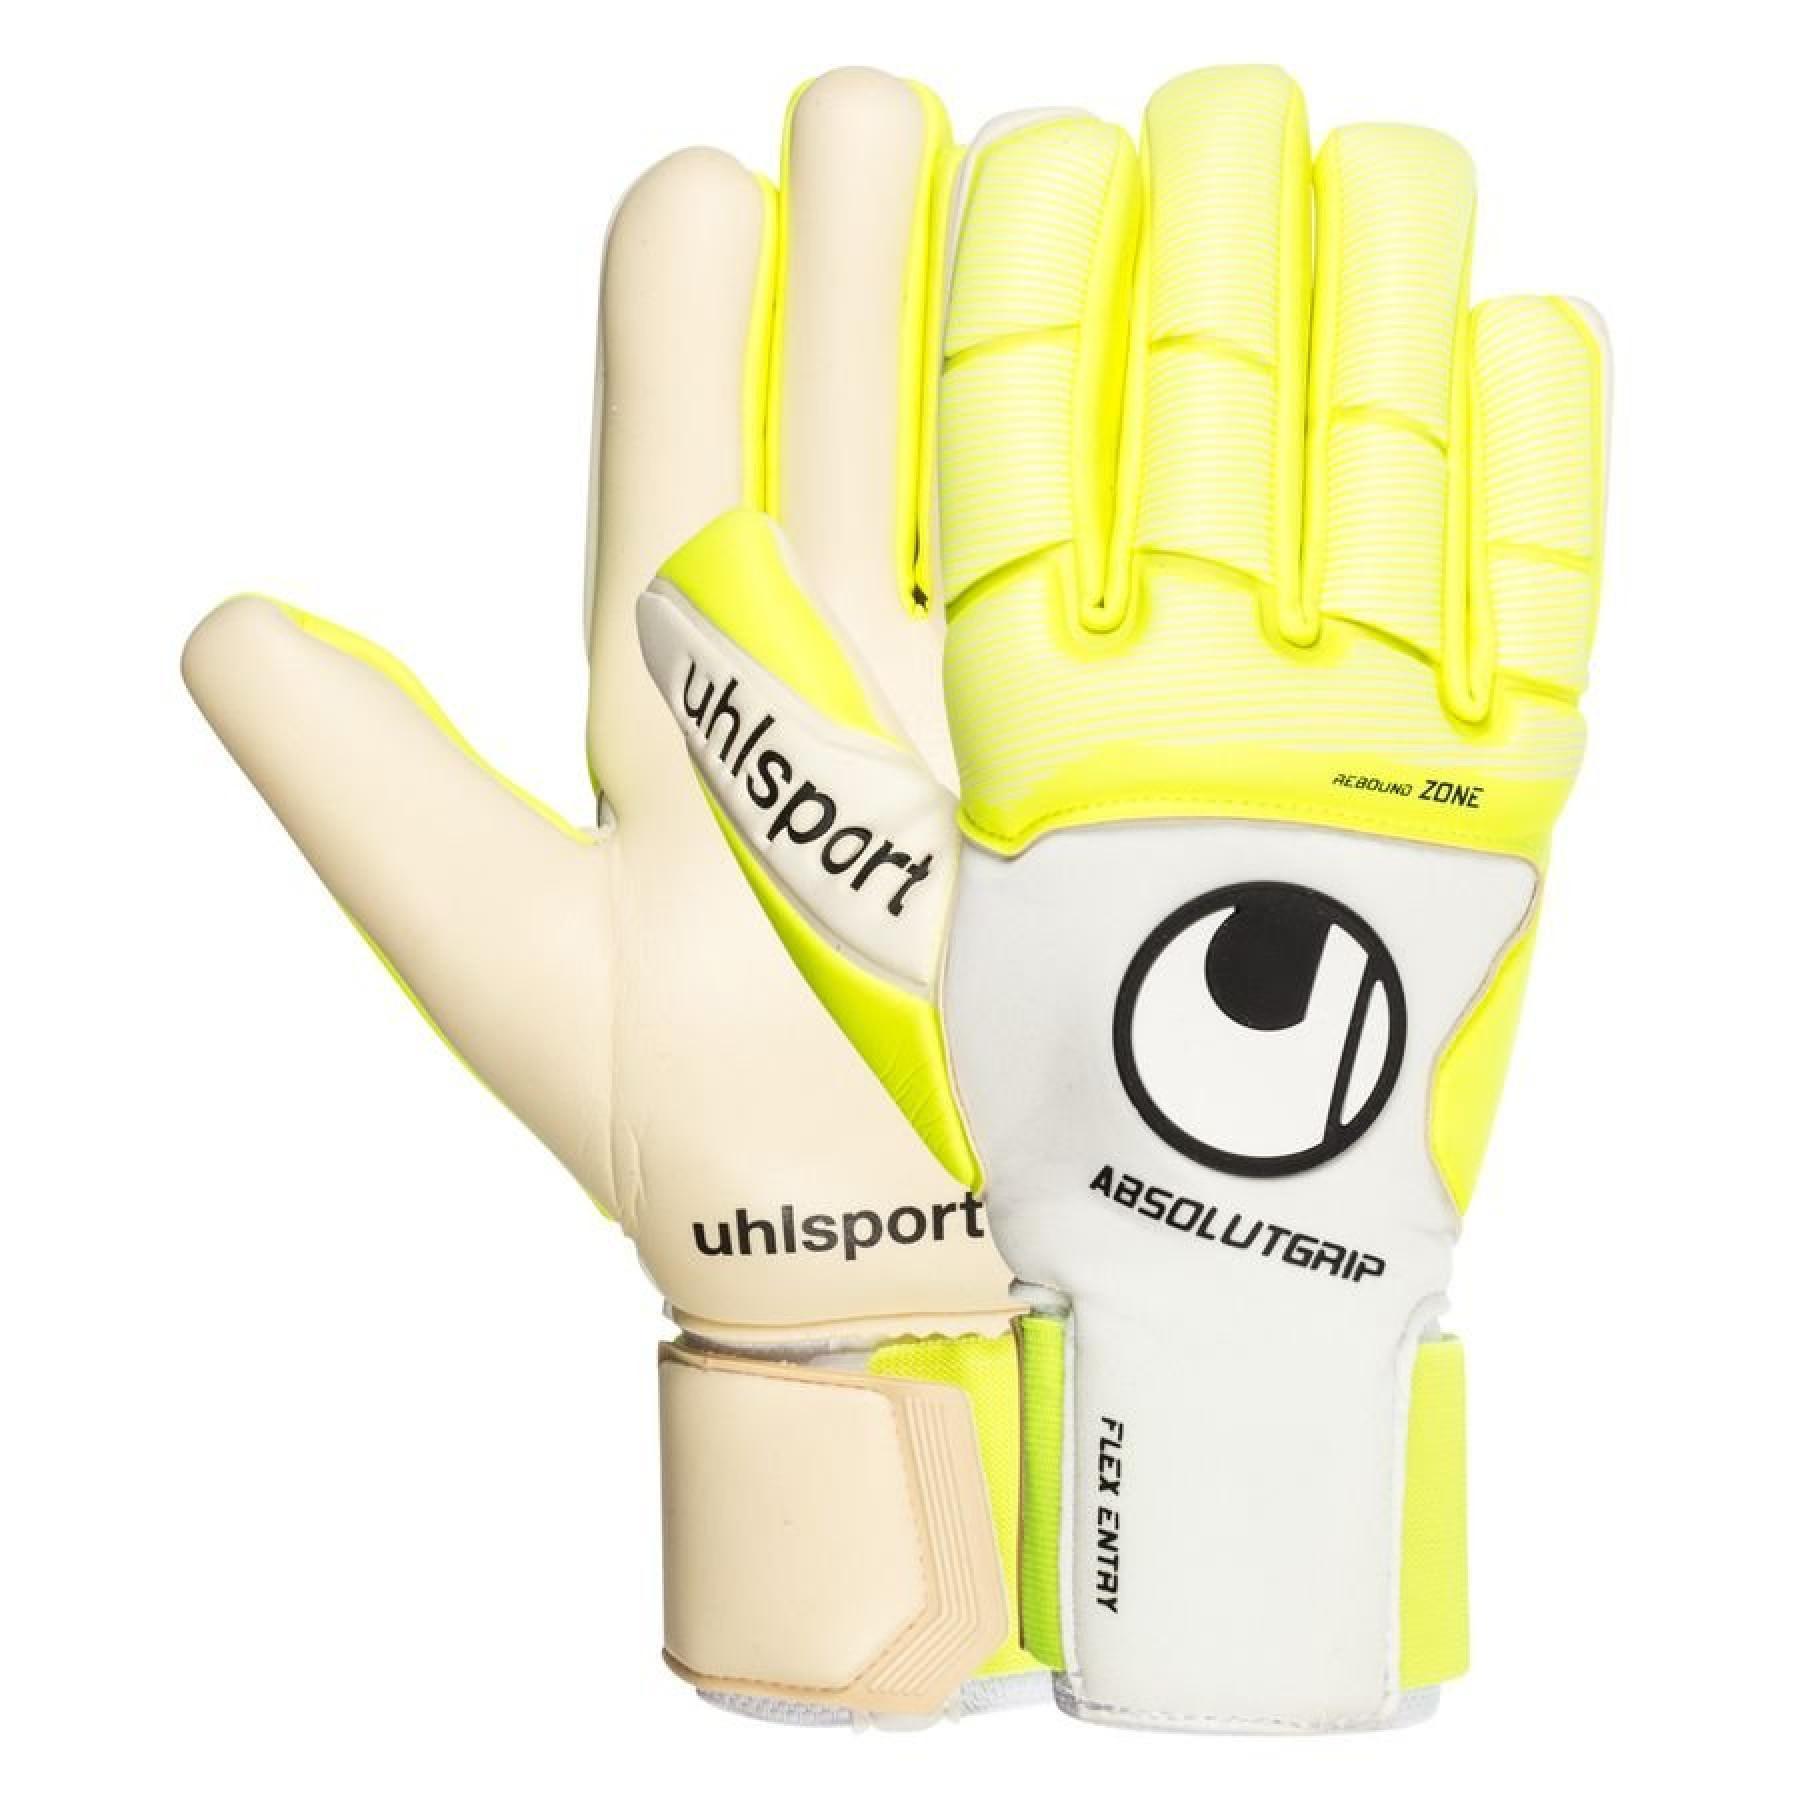 Goalkeeper gloves Uhlsport Pure Alliance AbsolutGrip HN